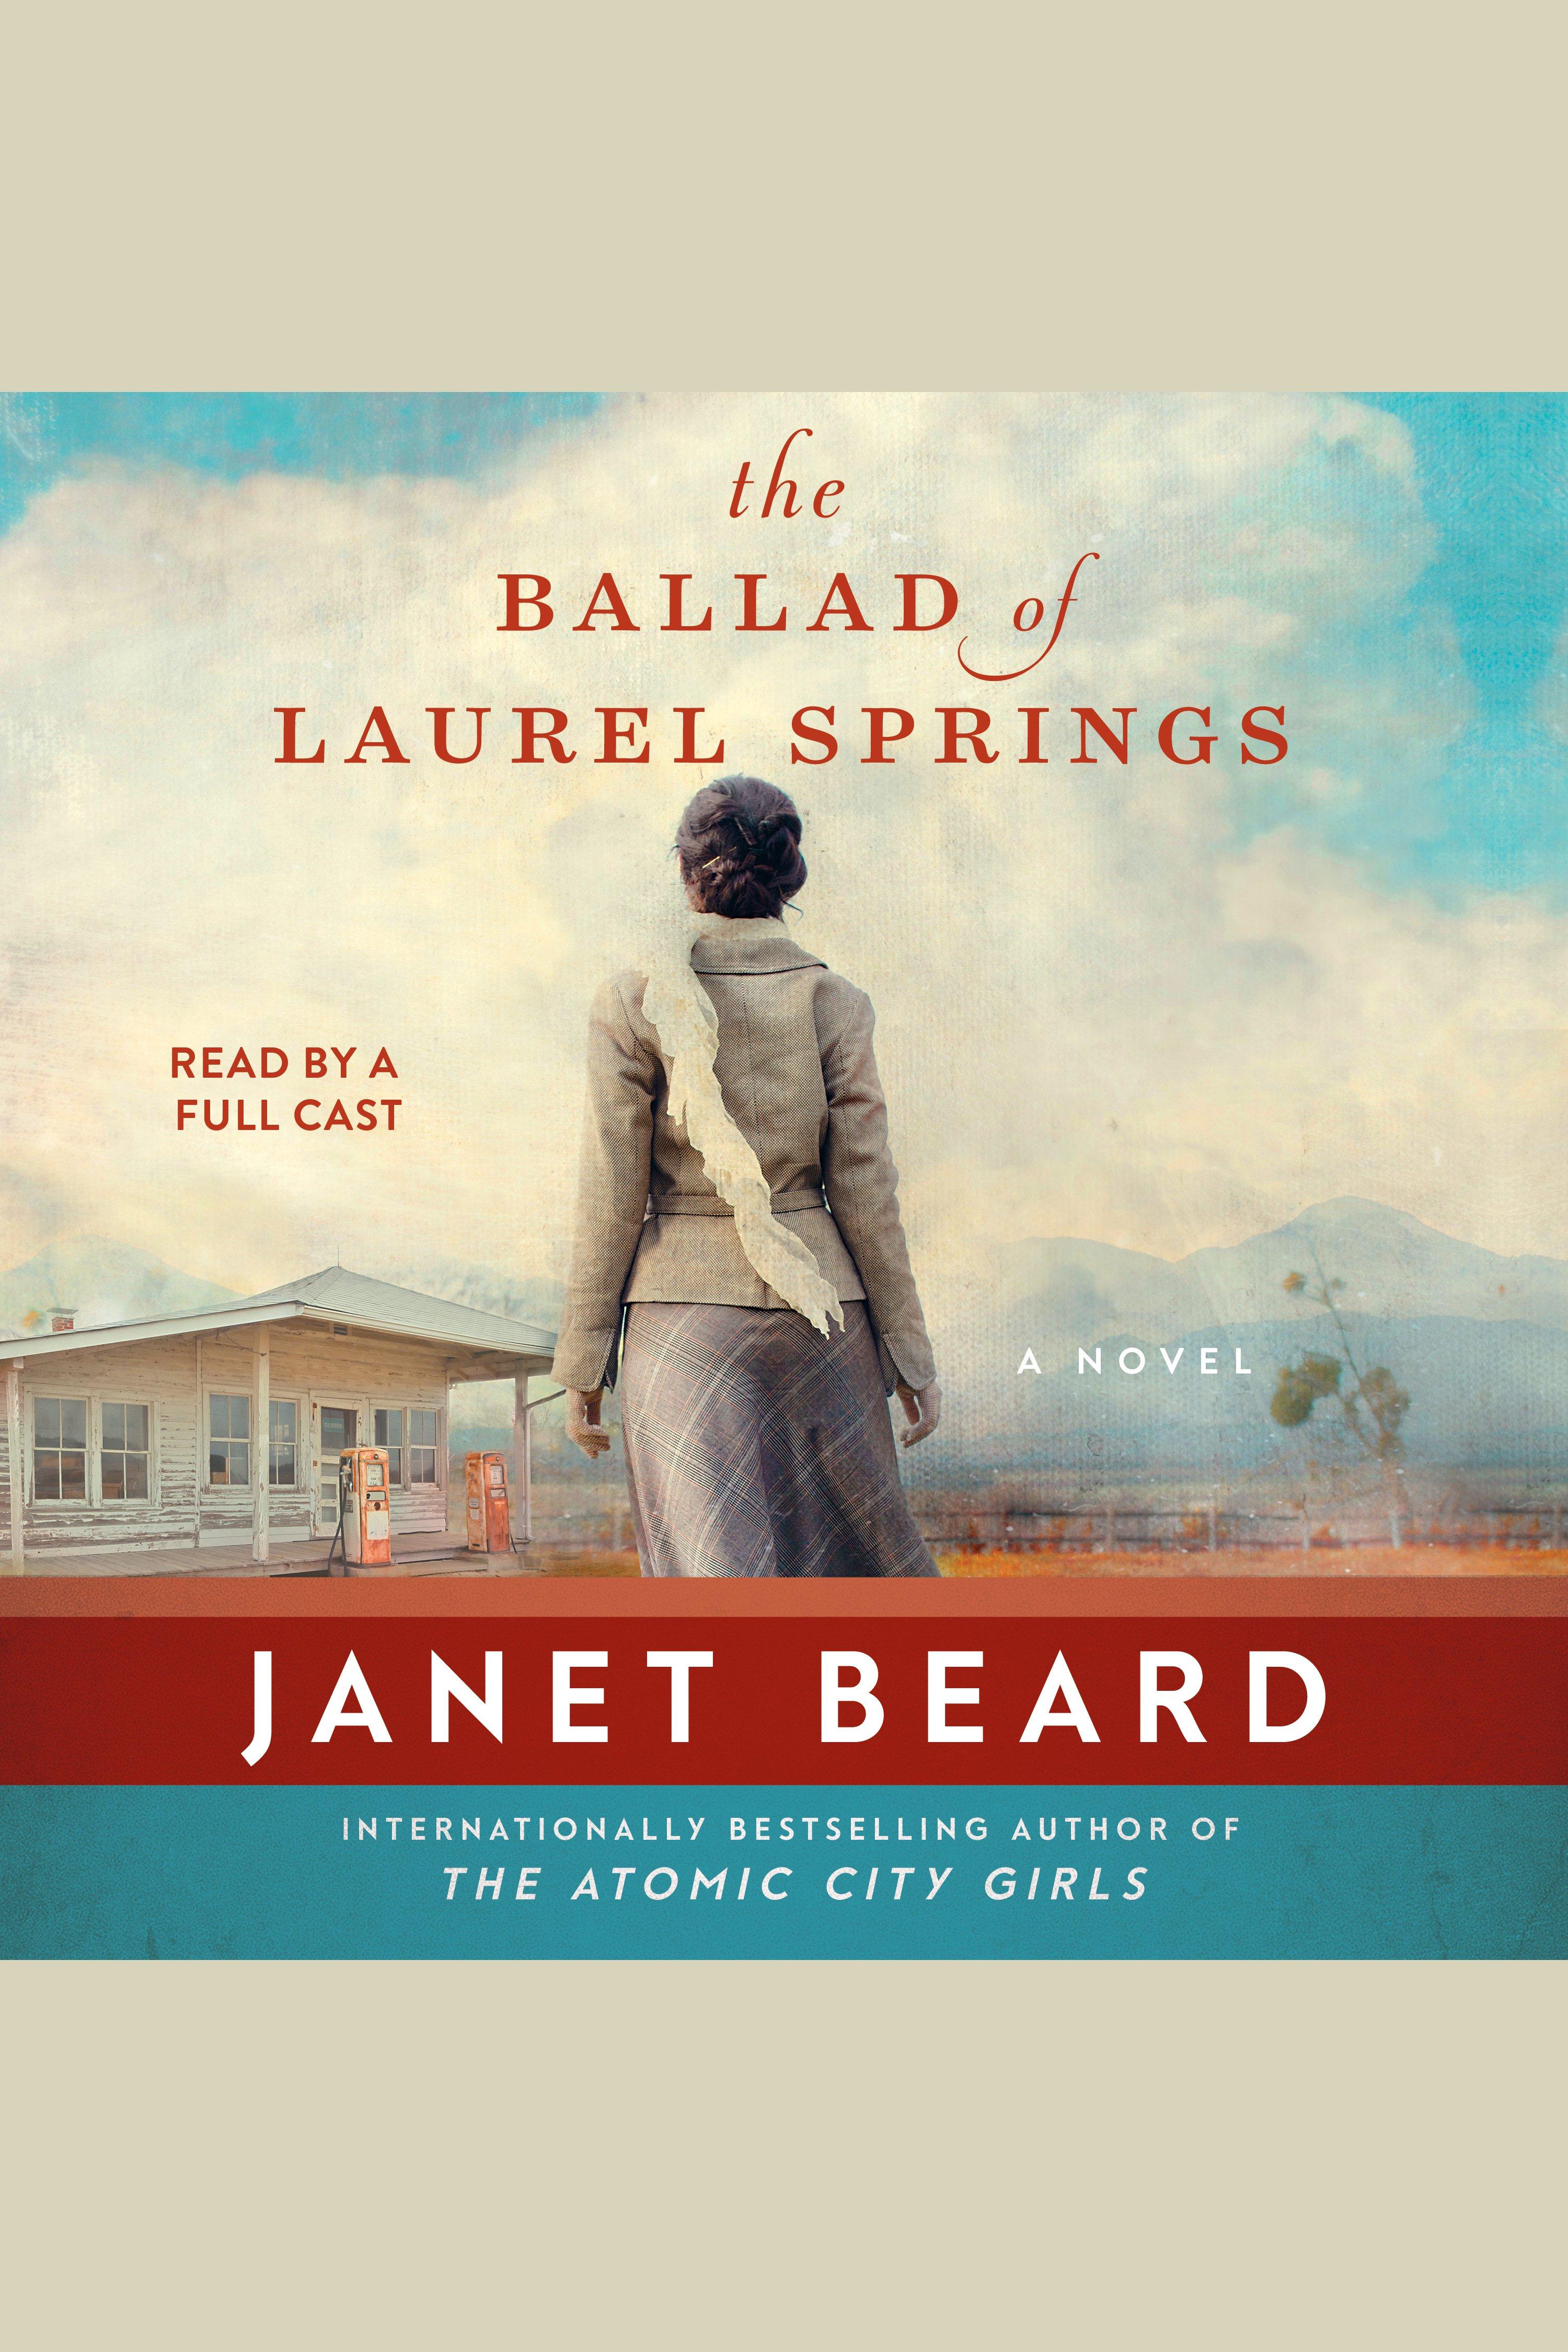 Ballad of Laurel Springs, The